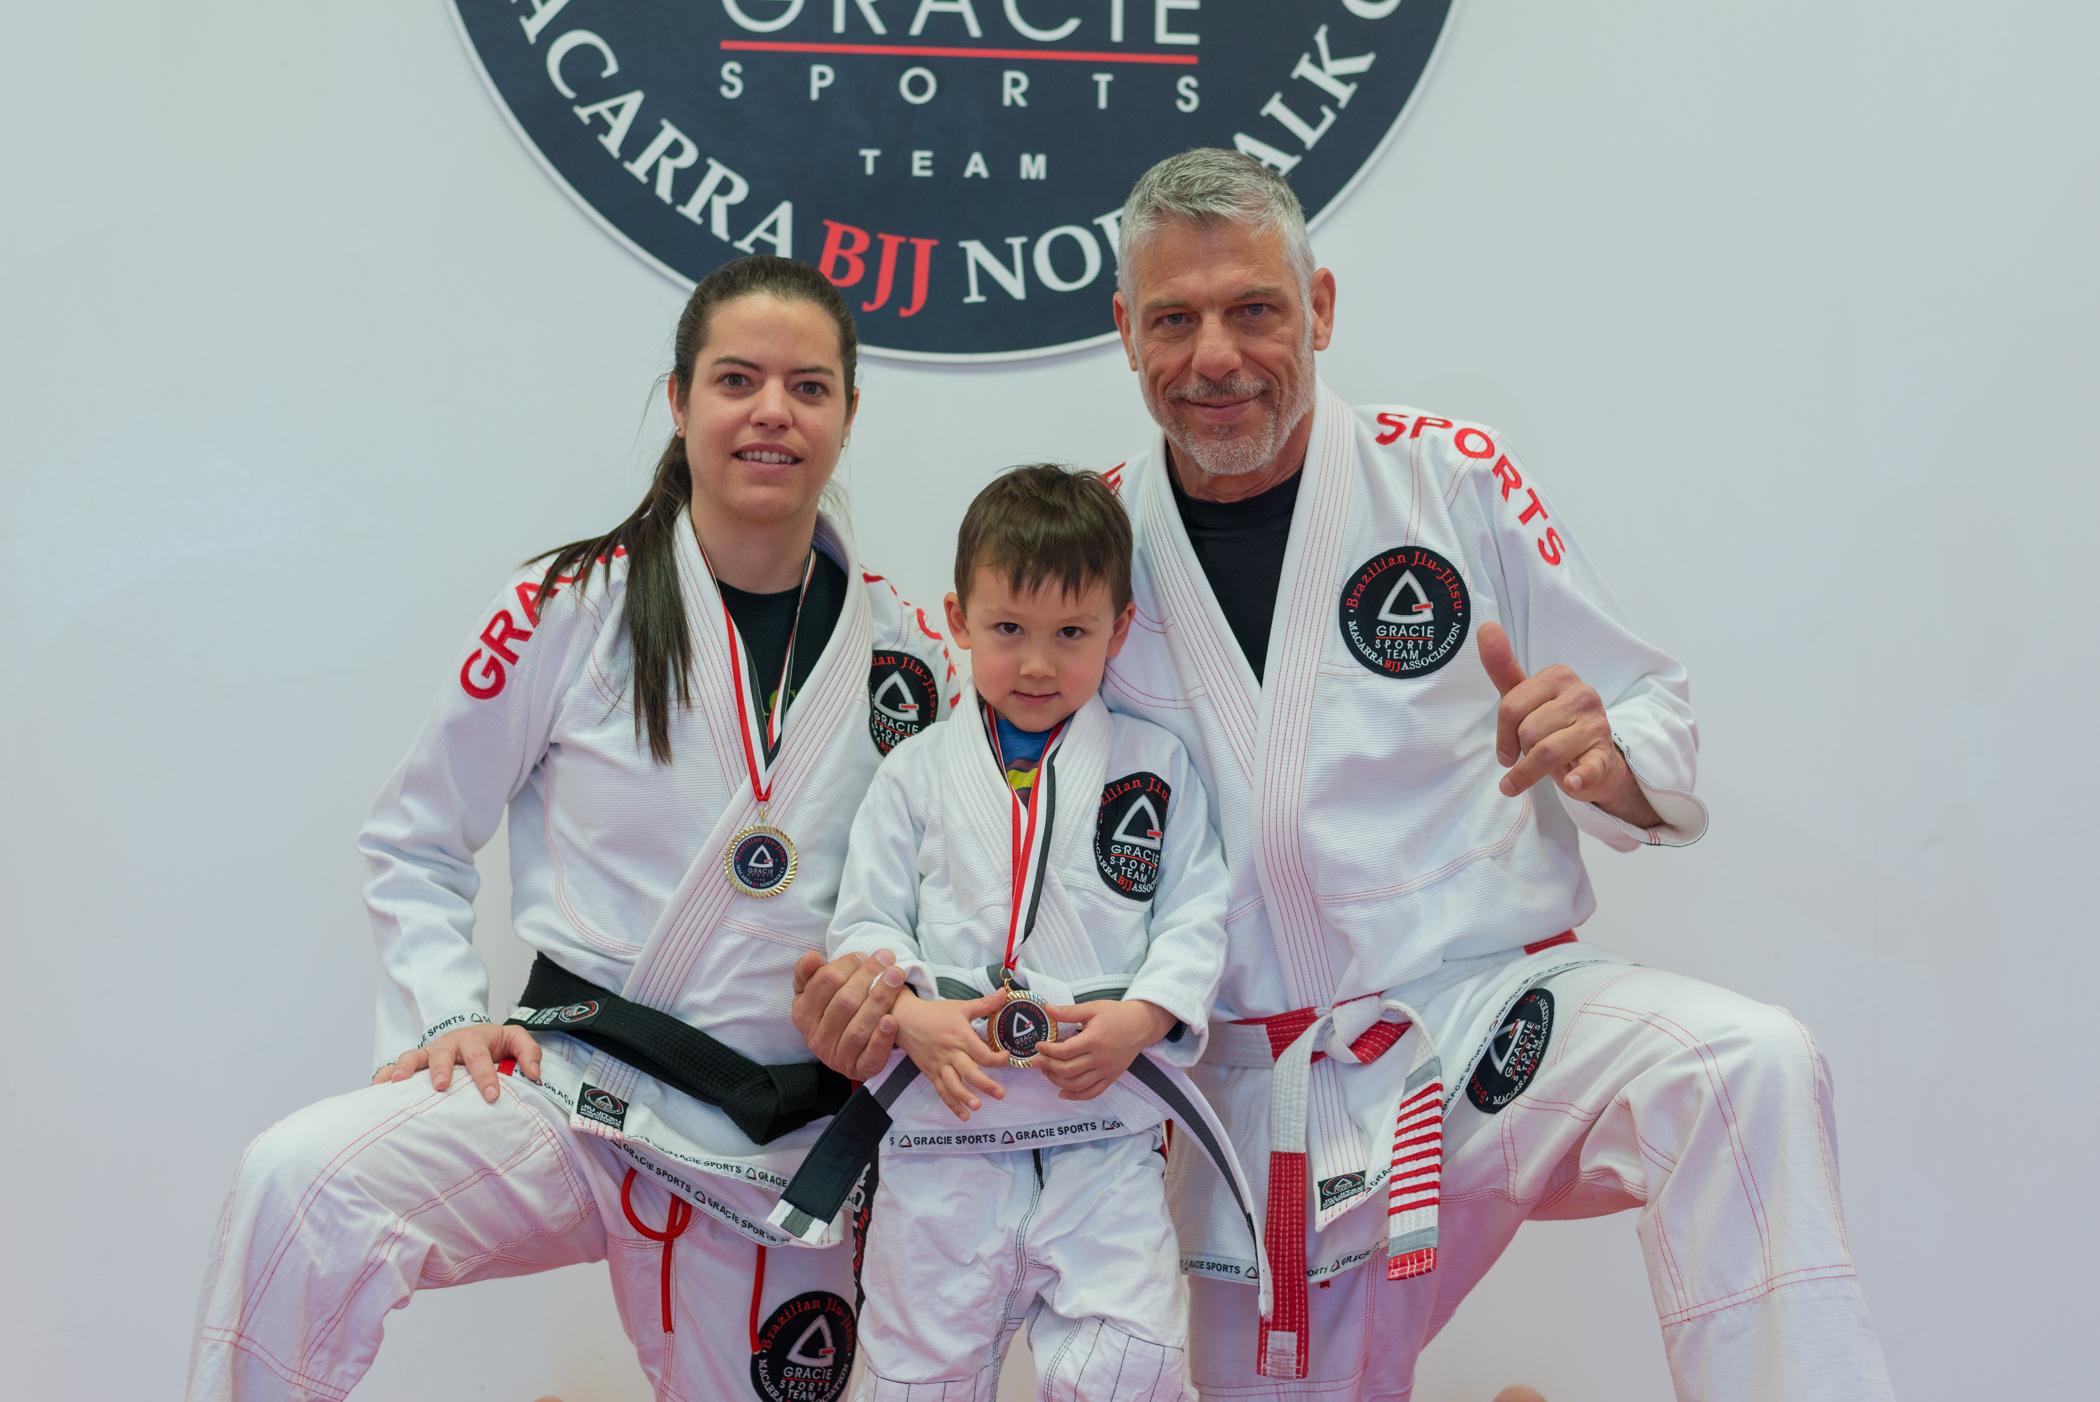 Gracie-Sports-Kids-164.jpg